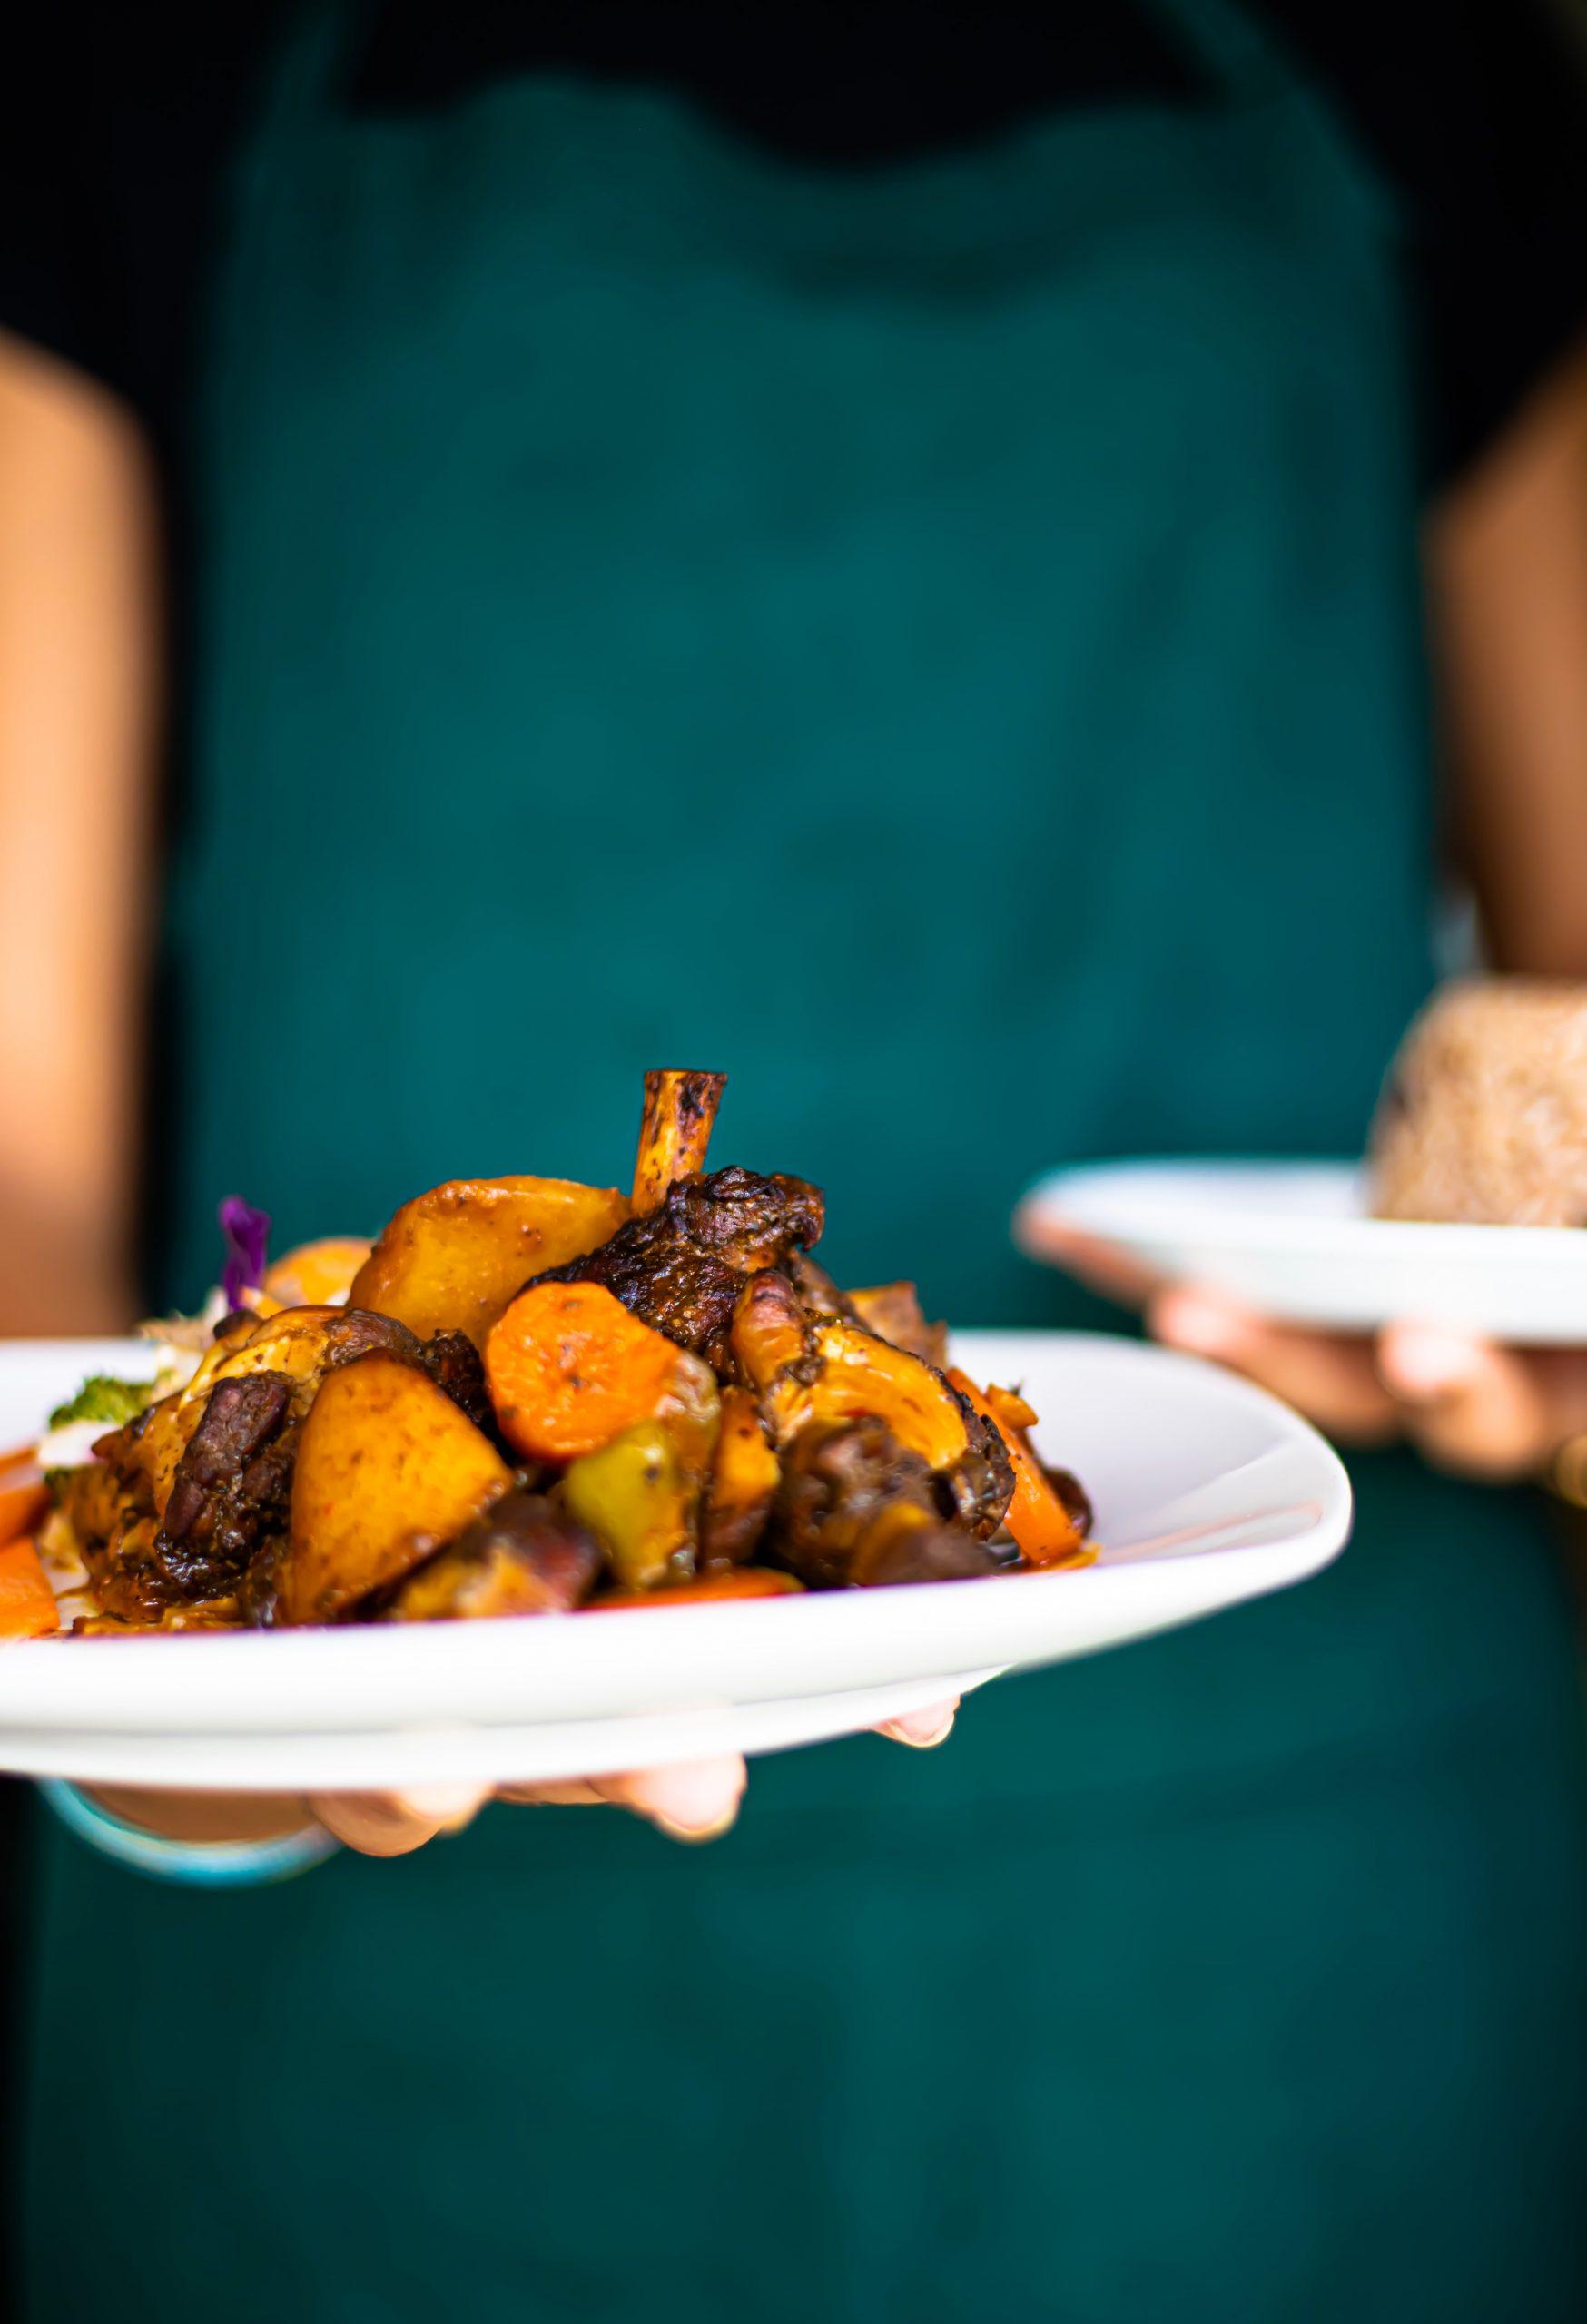 food in Jamaica, jamaican food, jamaican cuisine, jamaican dishes, jamaican drinks, jamaican appetizers, jamaican traditional food, Jerk chicken/pork/fish